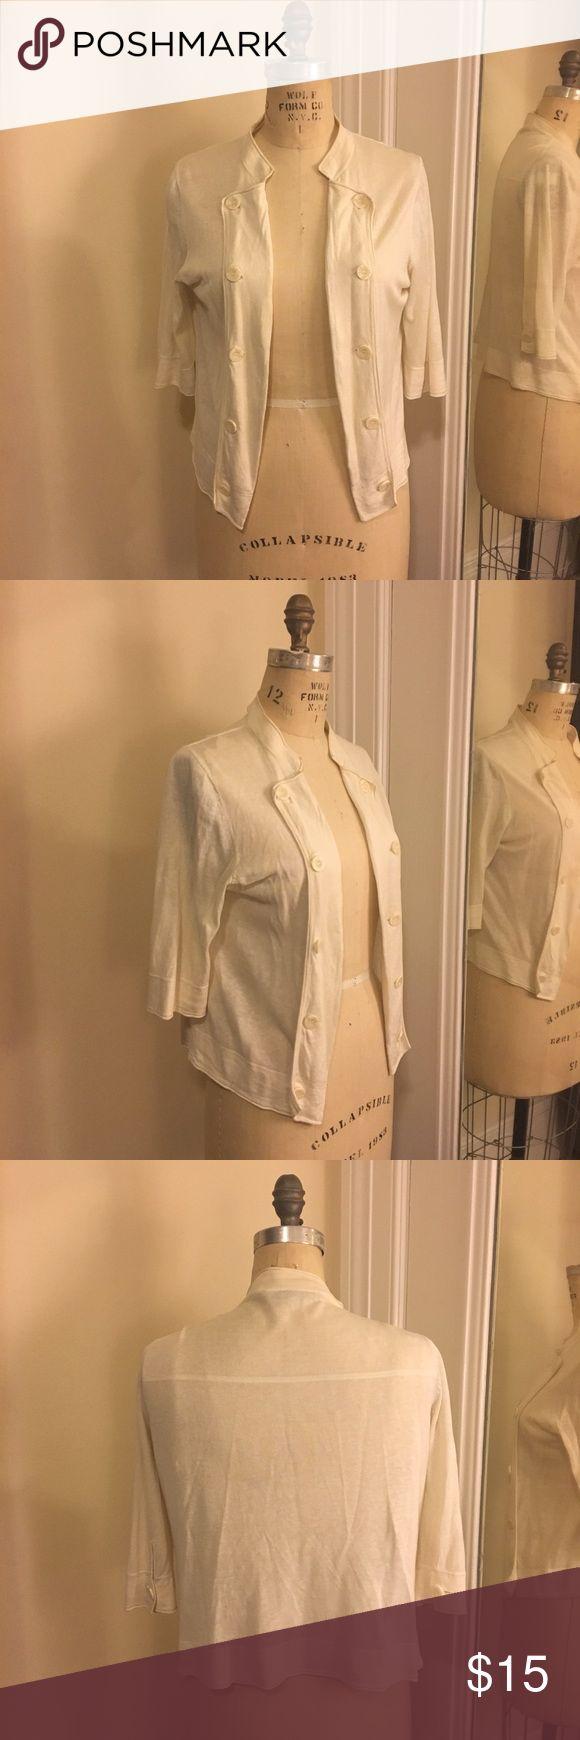 BCBGMAXAZRIA Nautical Cardigan in Cream L BCBGMAXAZRIA Nautical Cardigan. Excellent condition. 55% silk, 45% linen BCBGMaxAzria Sweaters Cardigans